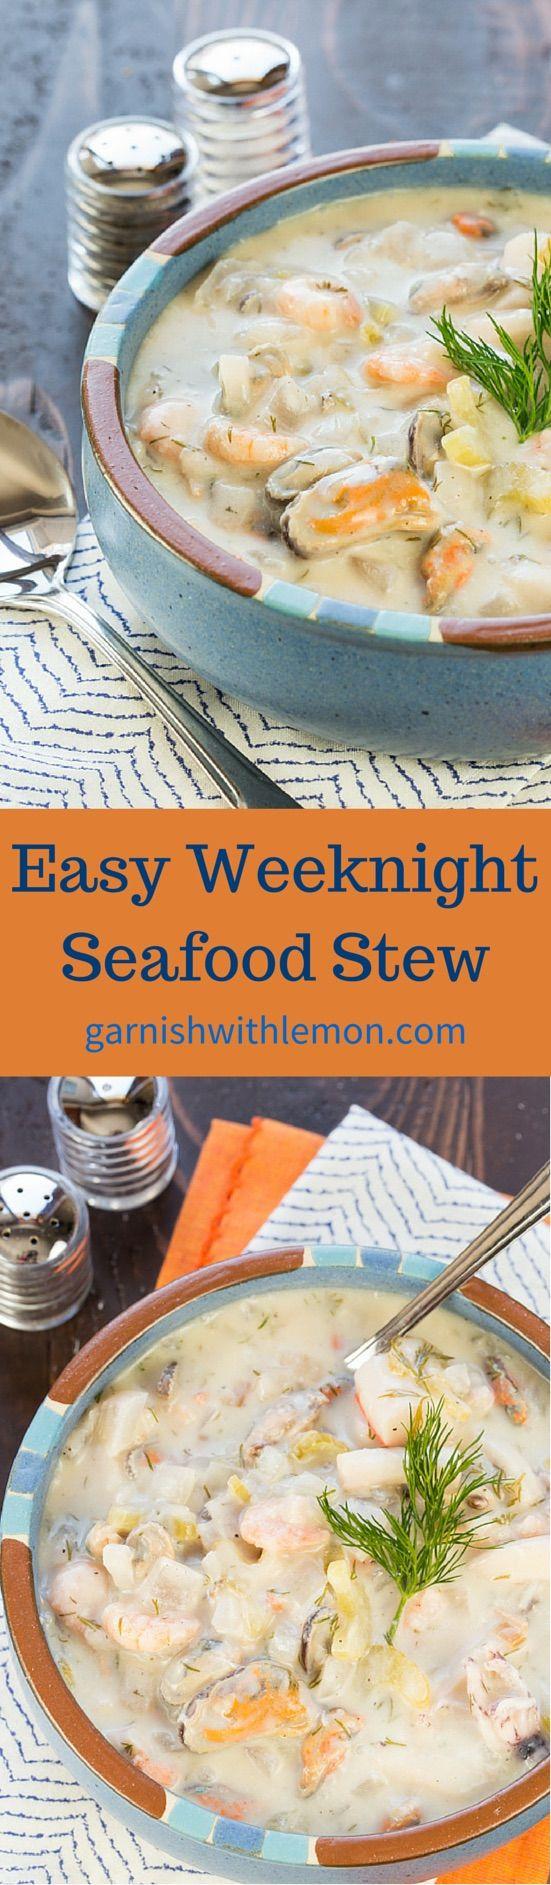 Easy Weeknight Seafood Stew - Garnish with Lemon